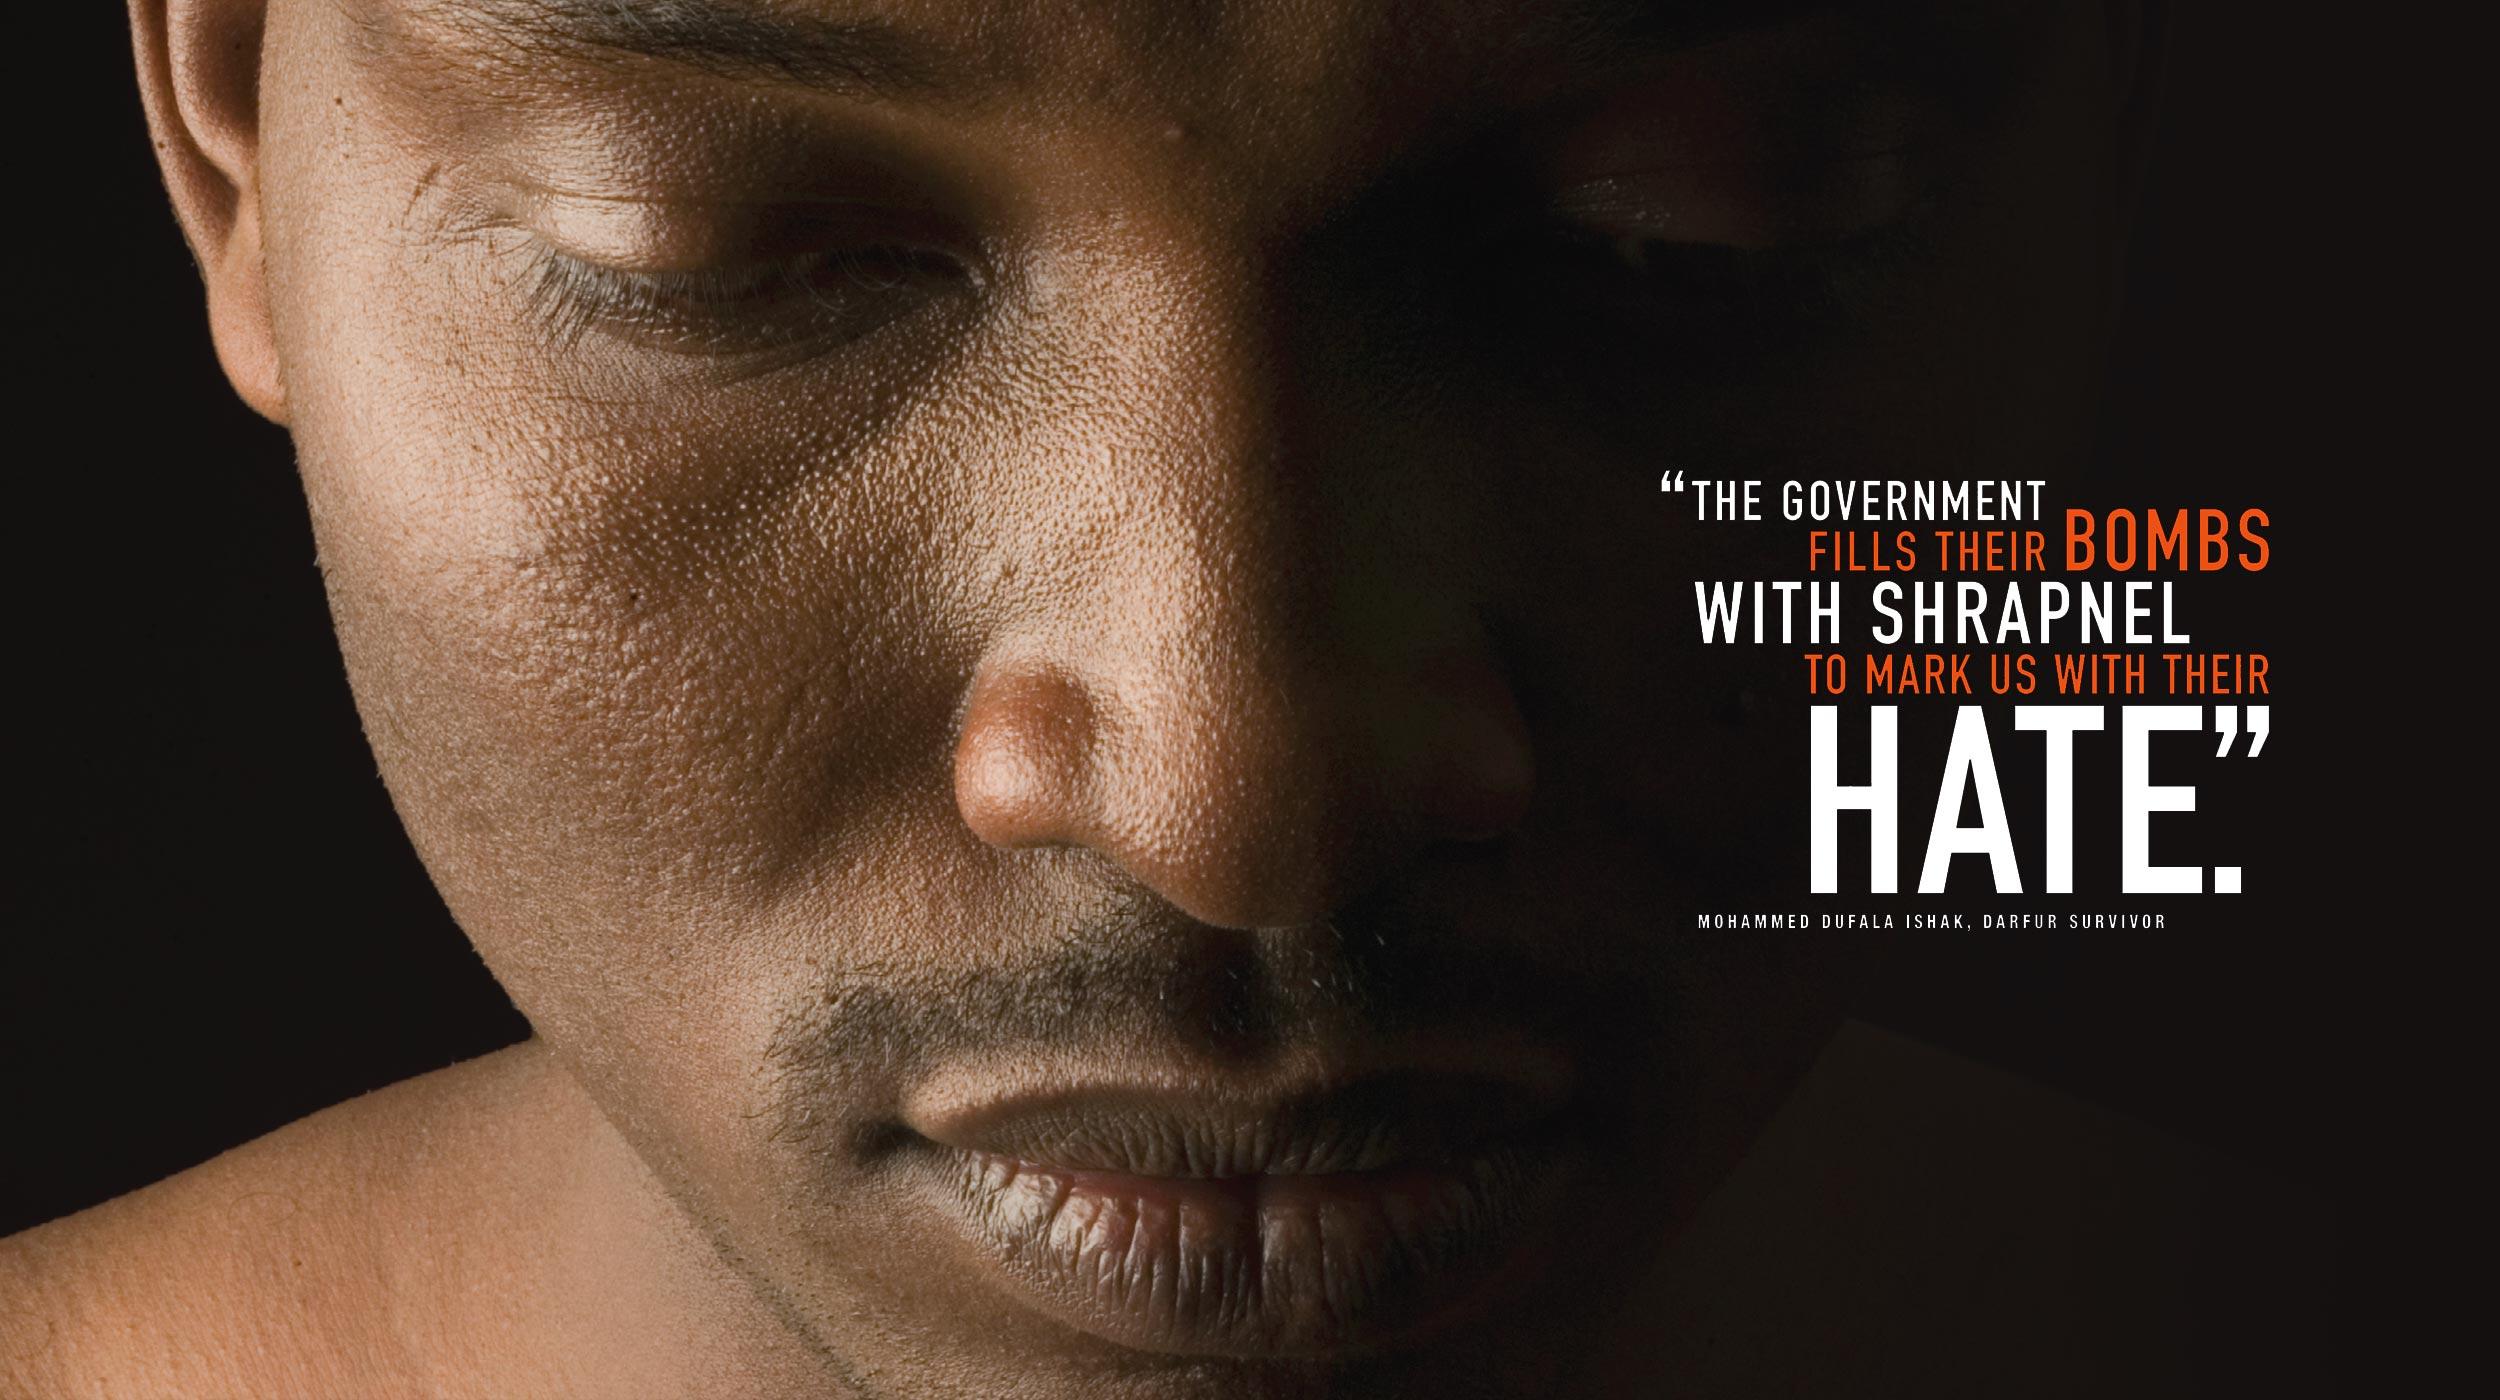 Save Darfur Hero Image_2500x1400.jpg